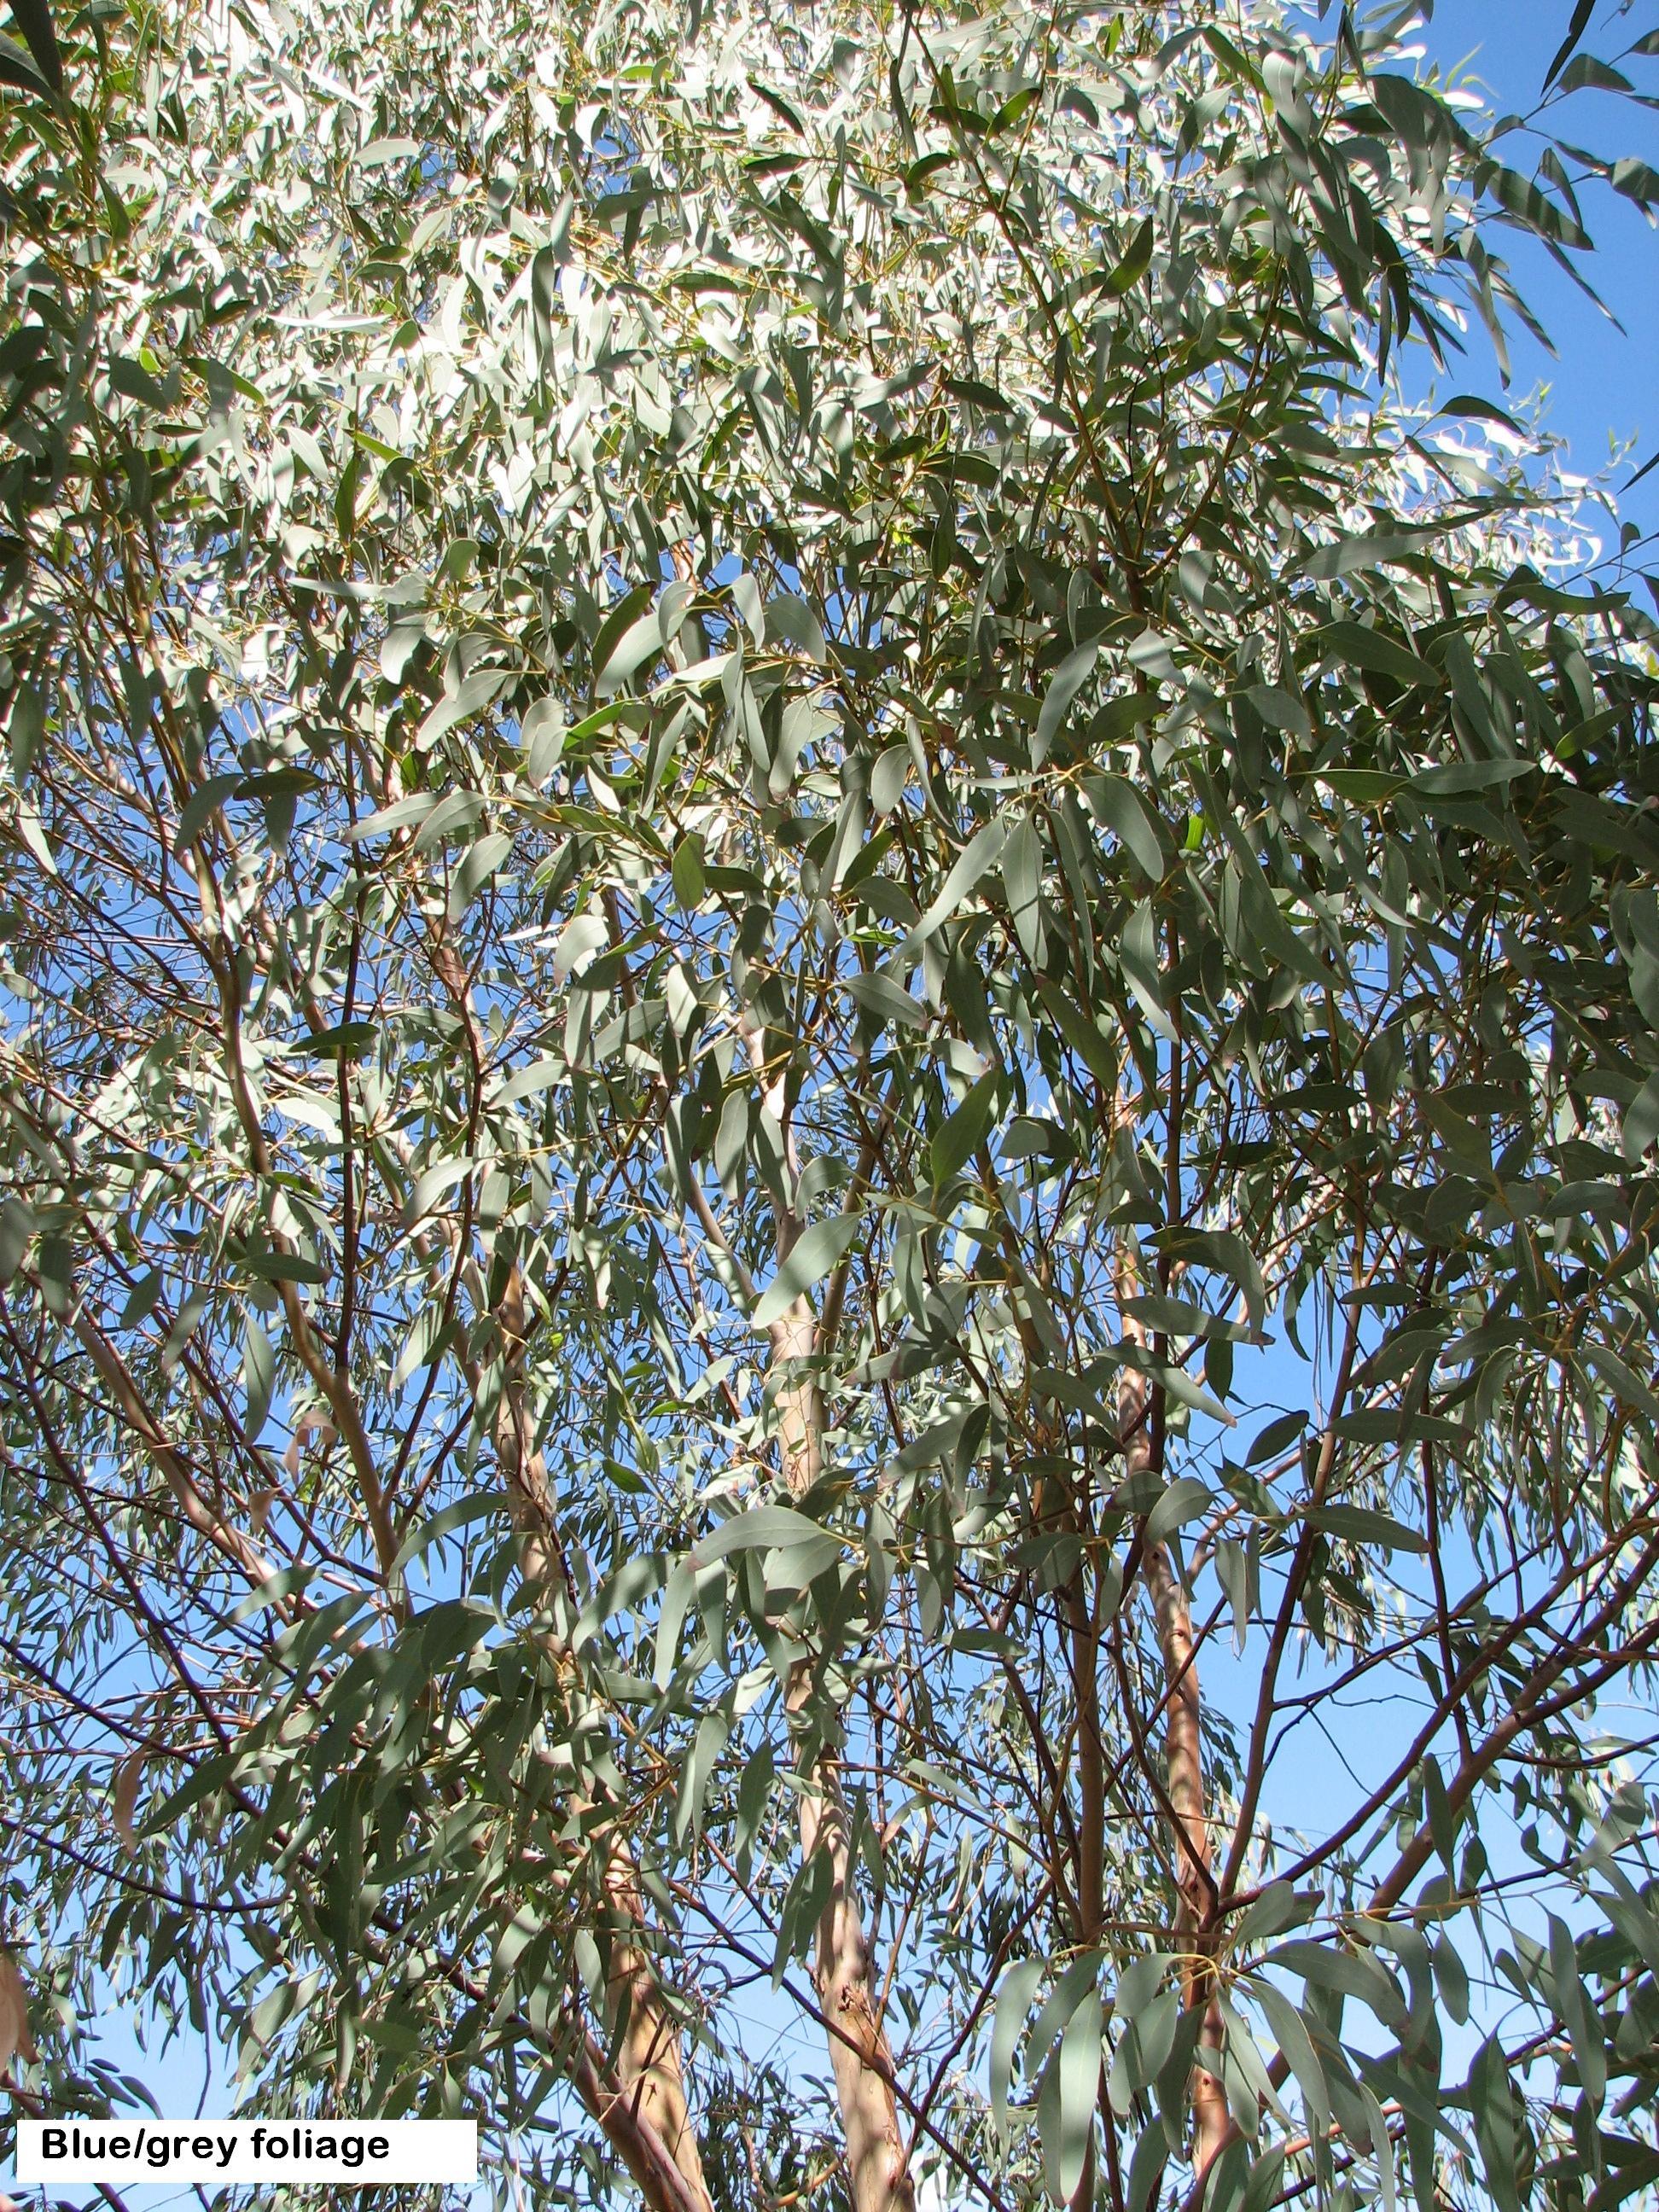 t5 E. sideroxylon rosea blue grey foliage strong eucalyptus .jpg